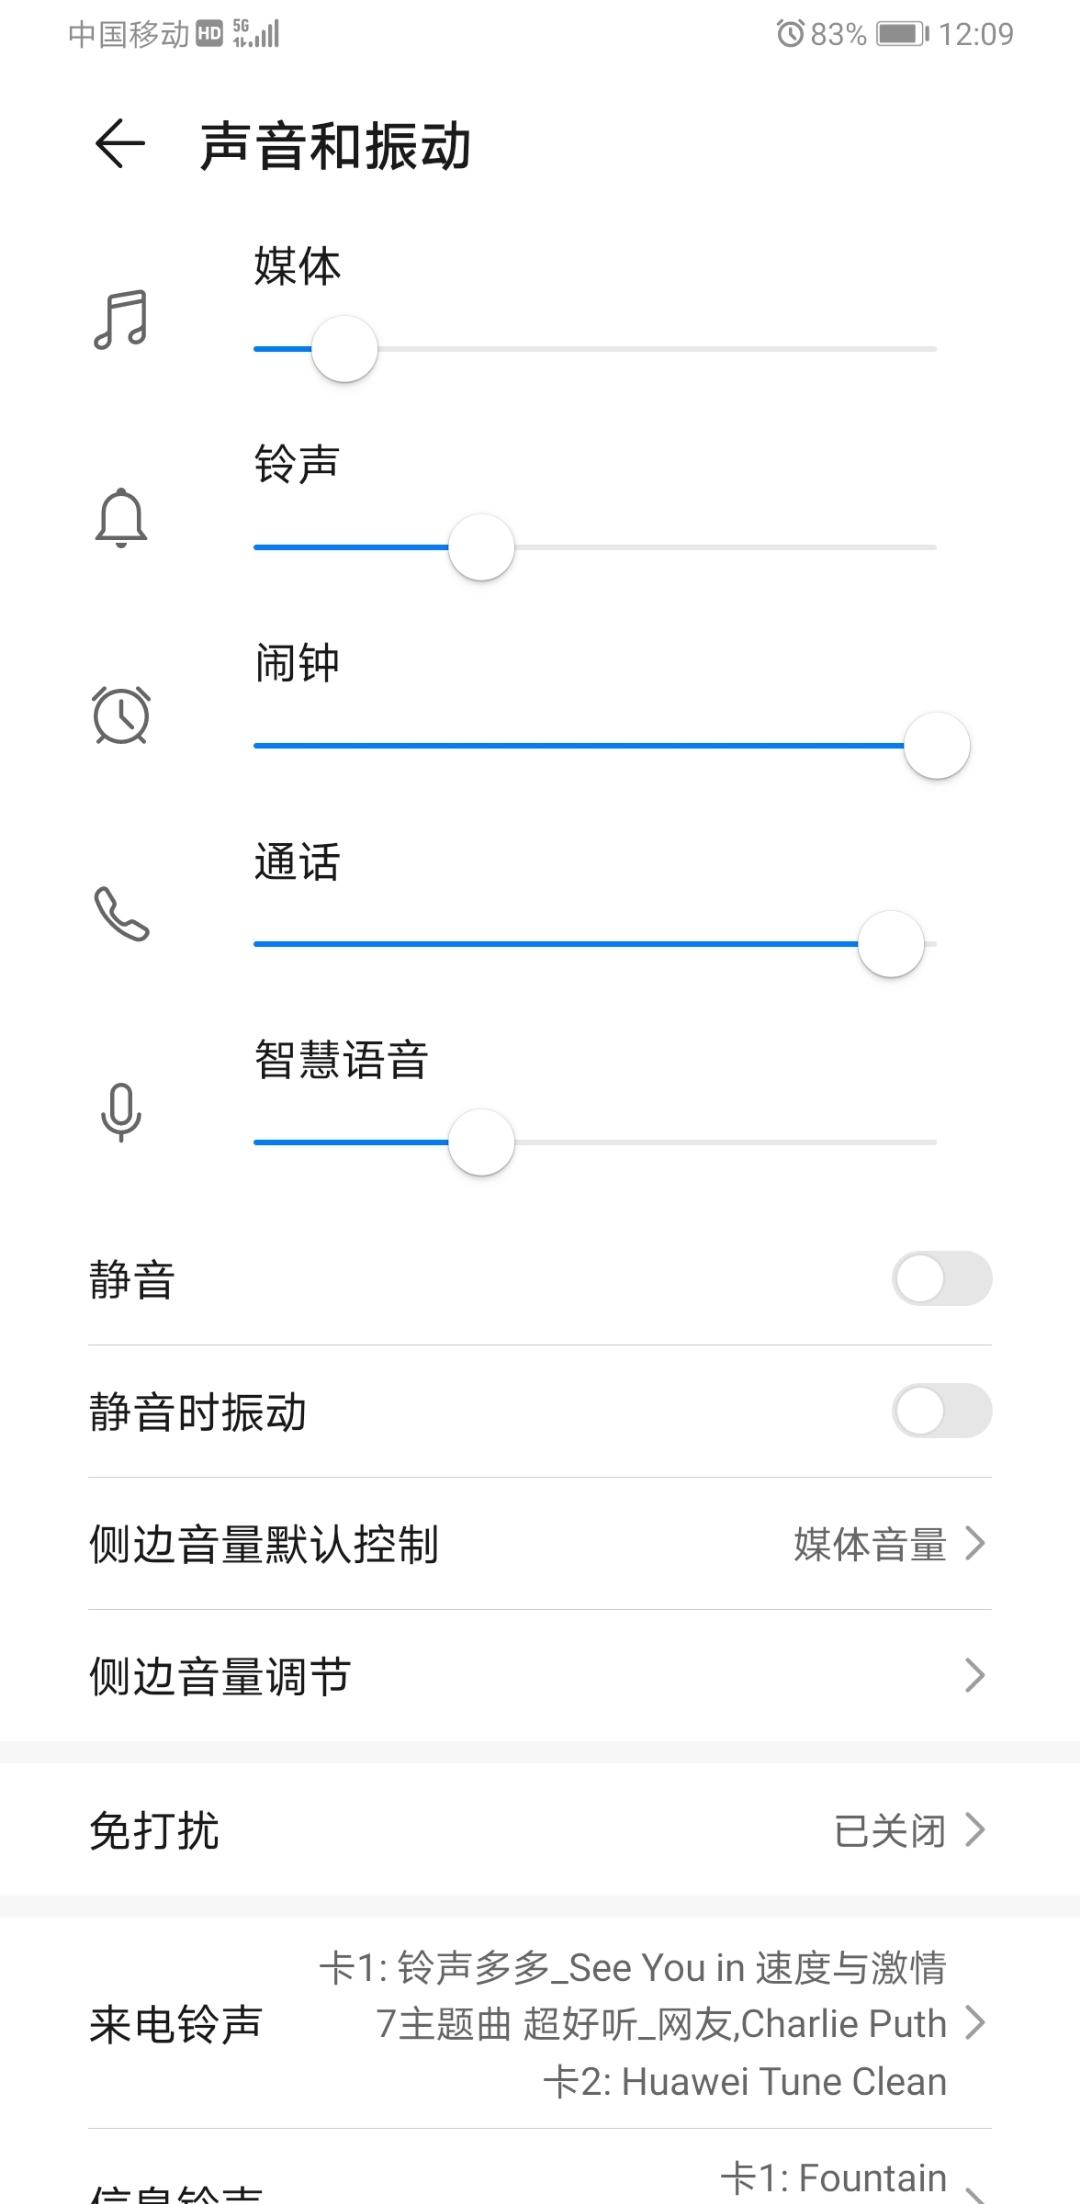 Screenshot_20200513_120955_com.android.settings.jpg